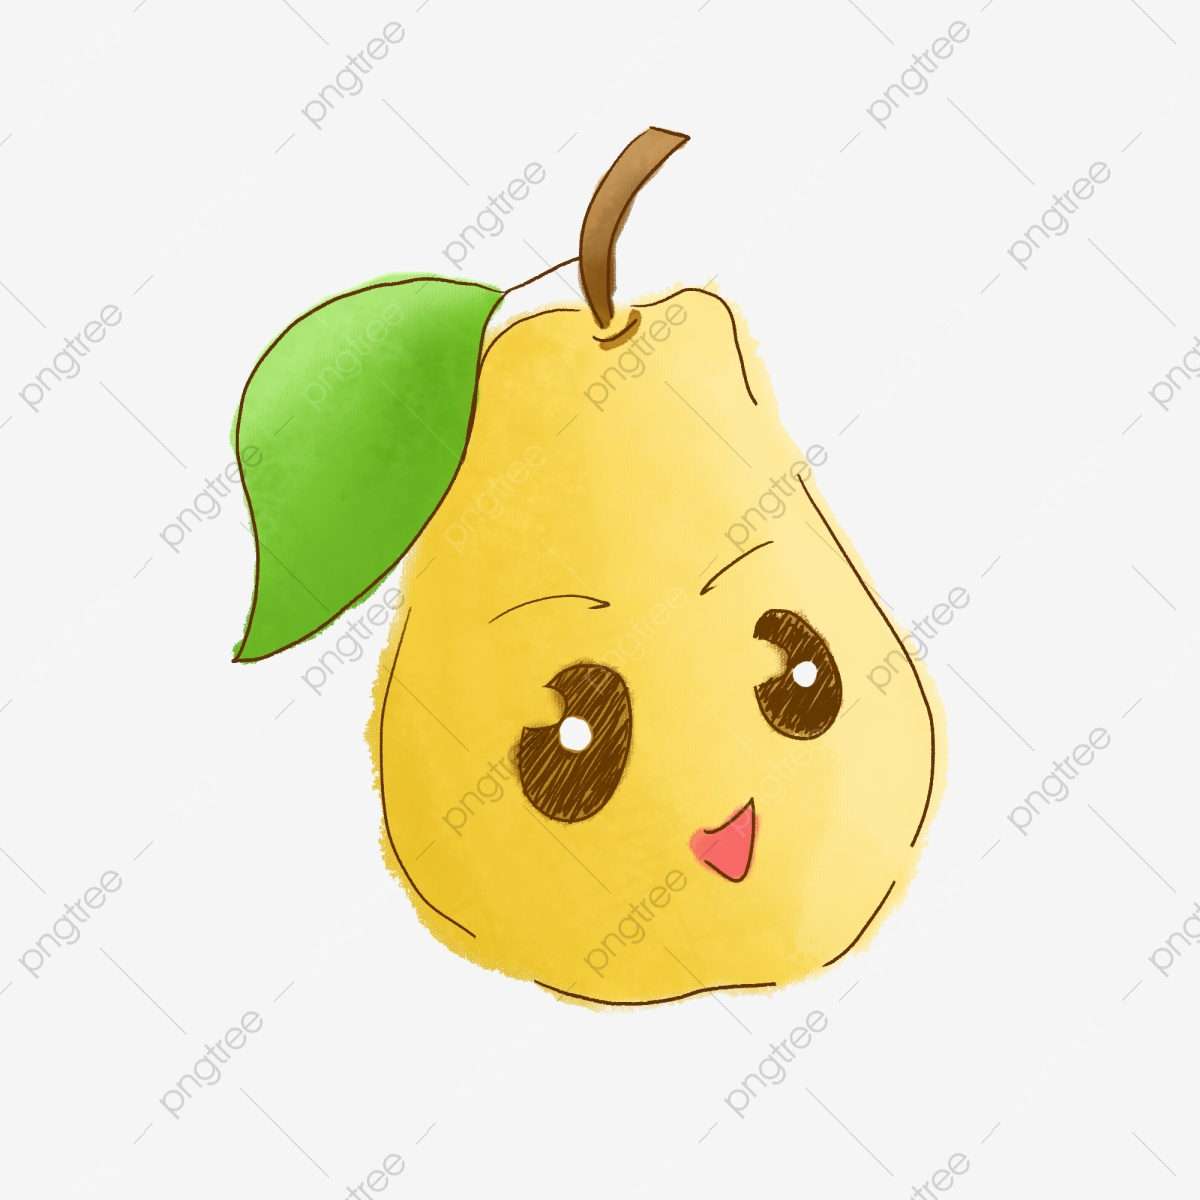 Pear clipart drawn. Fruit cartoon smiley yellow